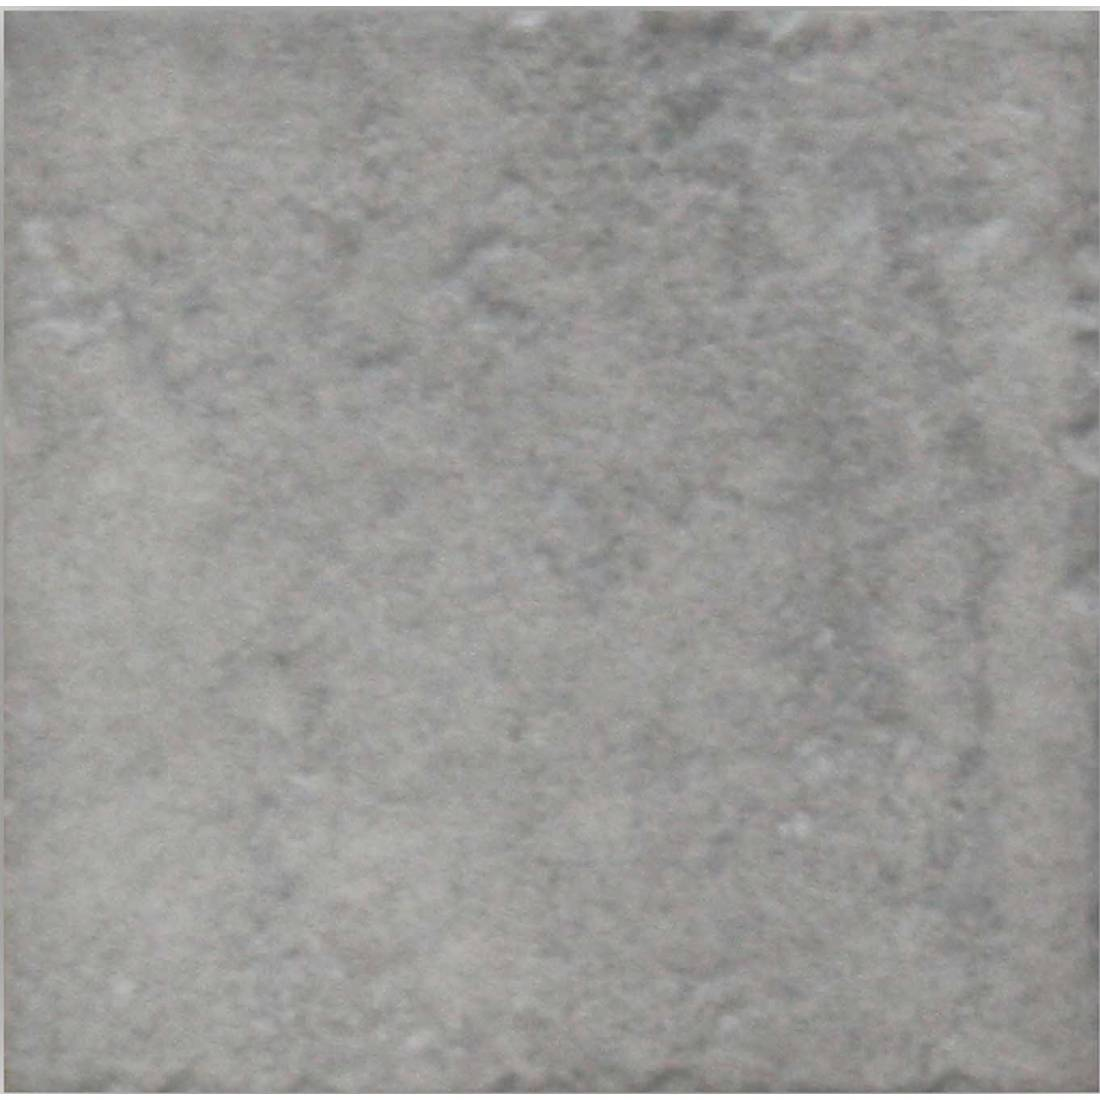 Onice 10x10 Grey Matt 1